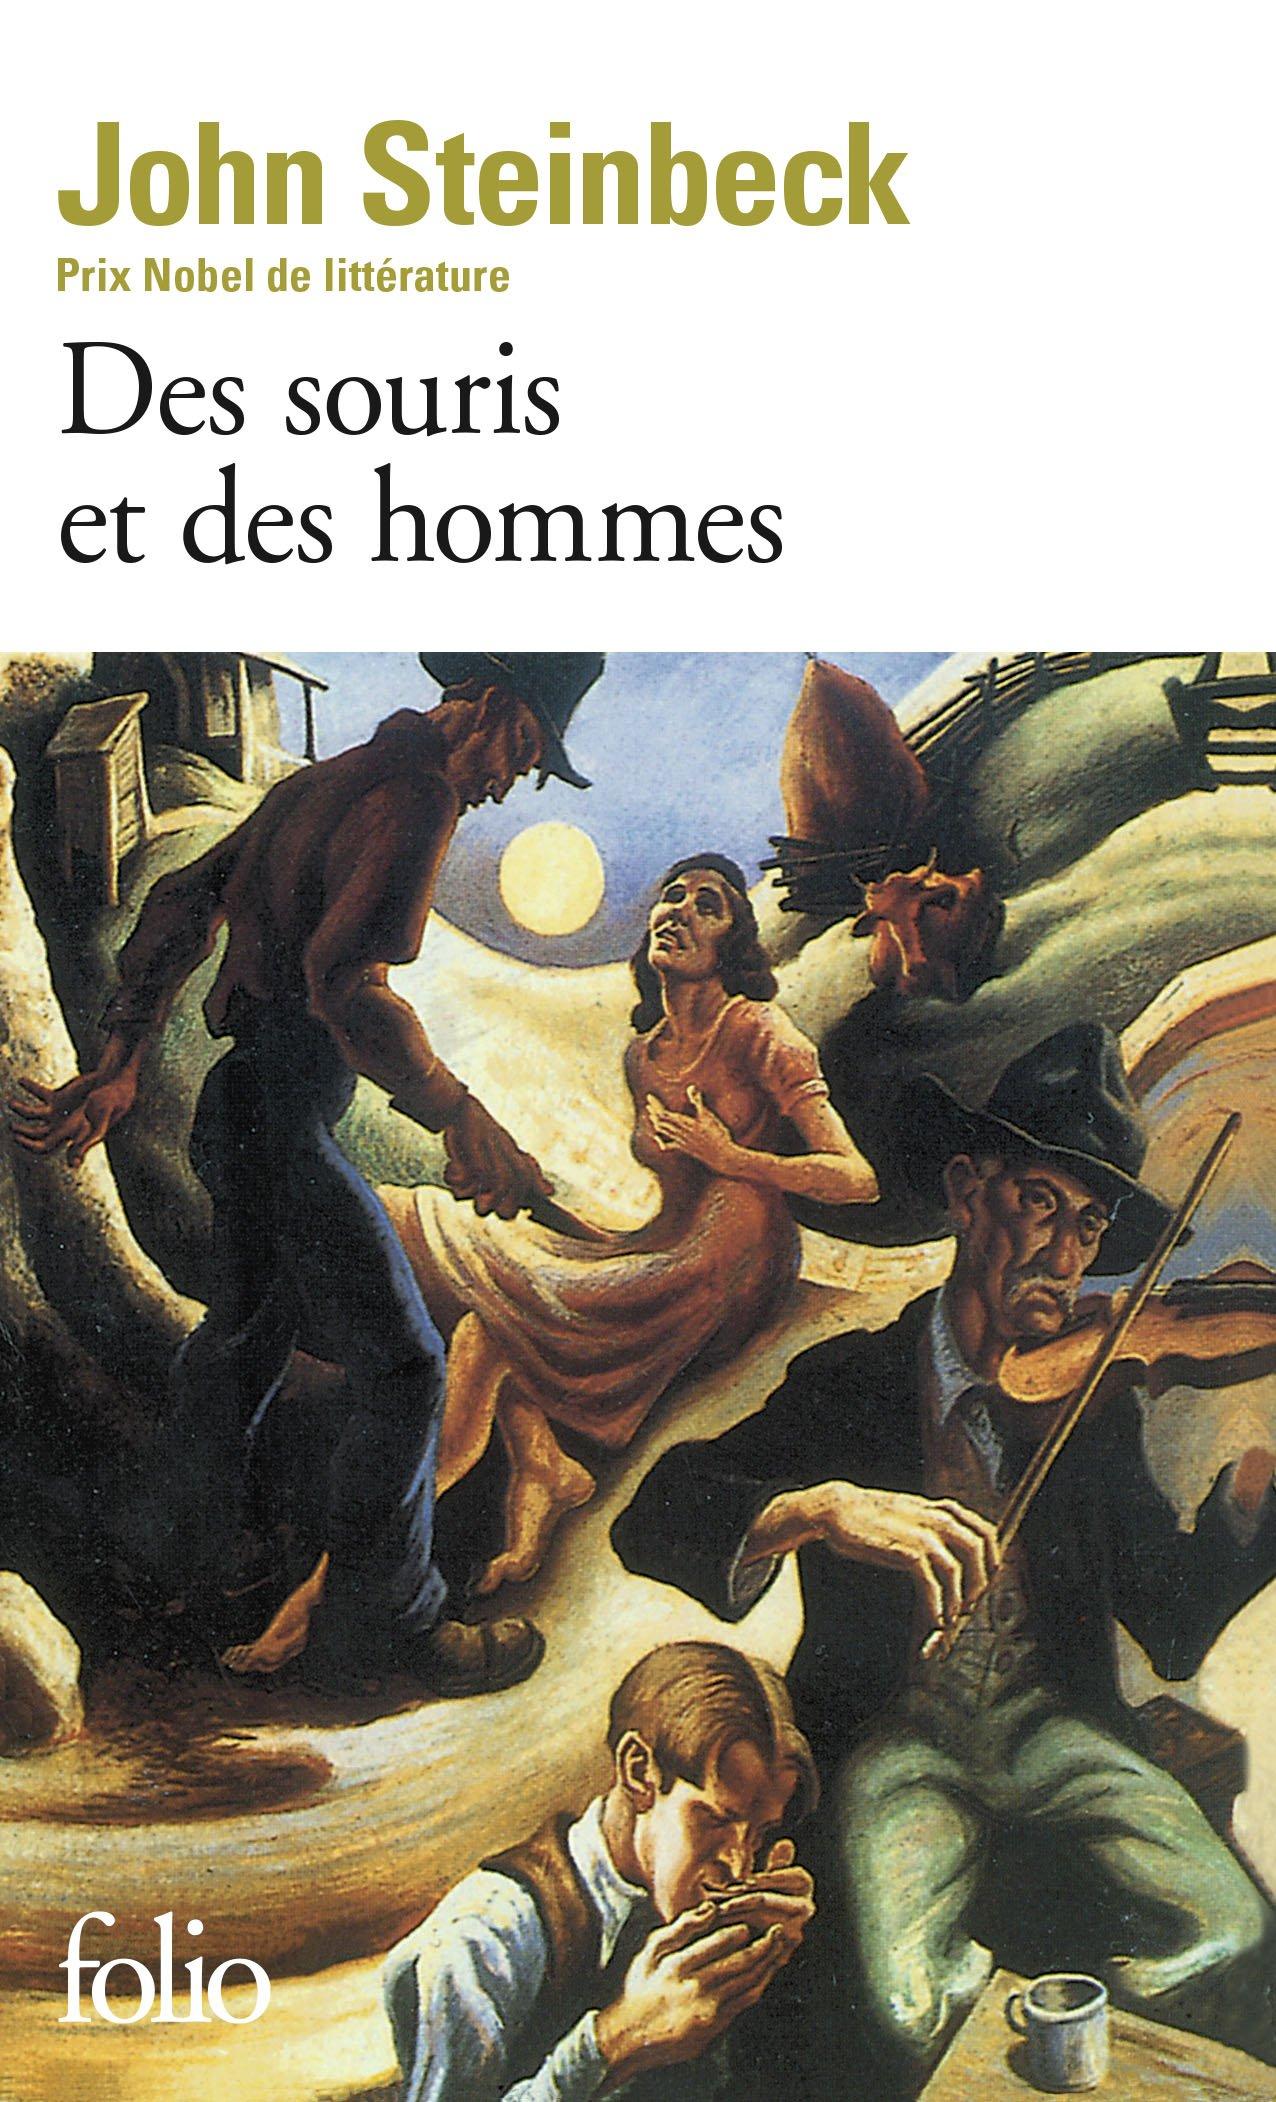 Des souris et des hommes Poche – 16 février 1972 John Steinbeck Joseph Kessel Maurice-Edgar Coindreau Gallimard